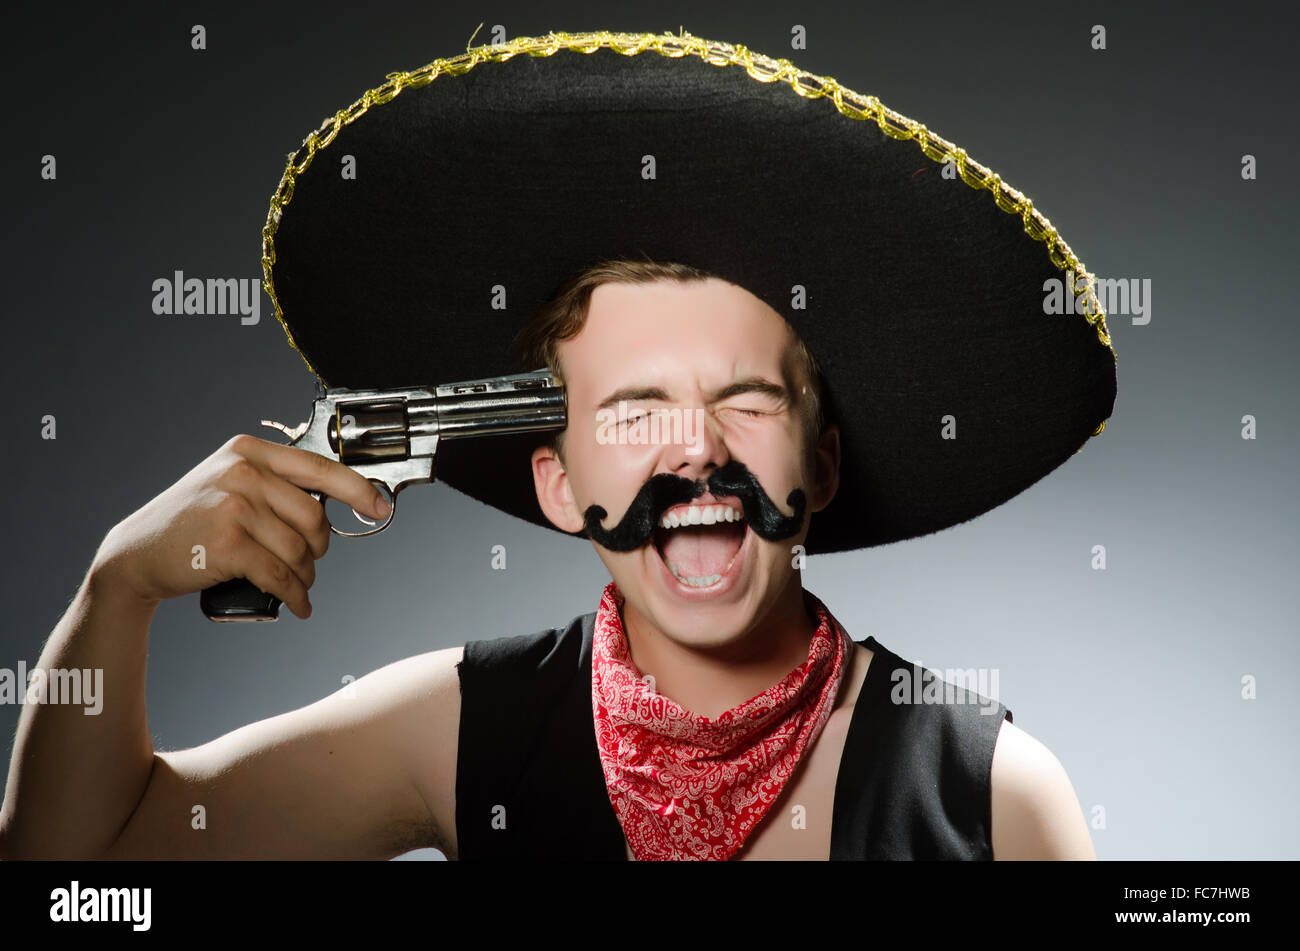 Funny guy wearing sombrero hat Stock Photo  93595415 - Alamy 1b133d03d44